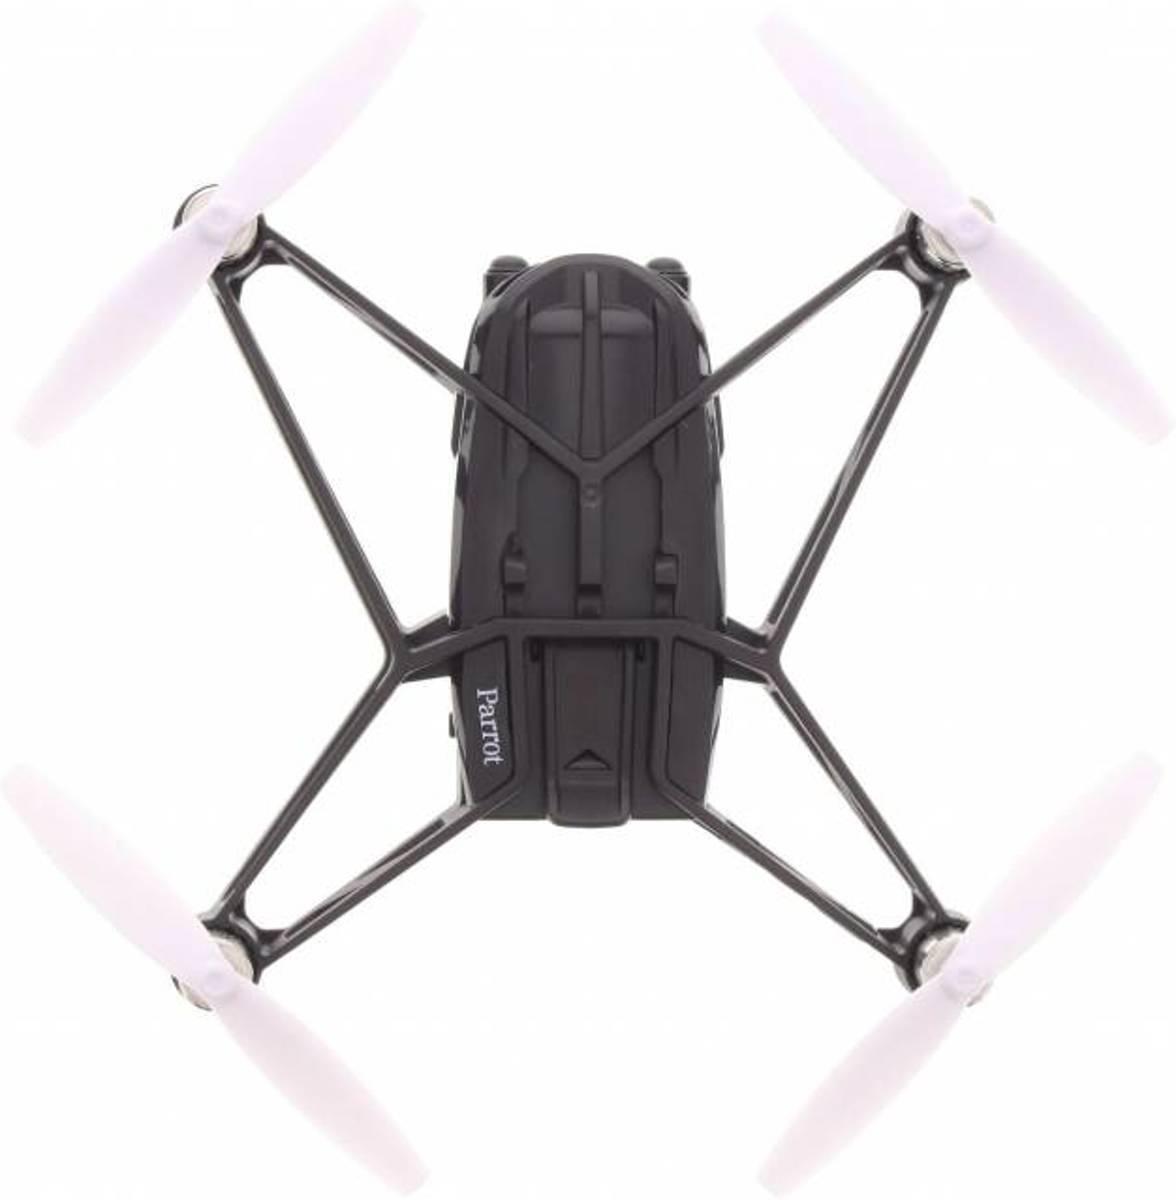 Parrot Minidrones Hydrofoil Drone Orak Speelgoed